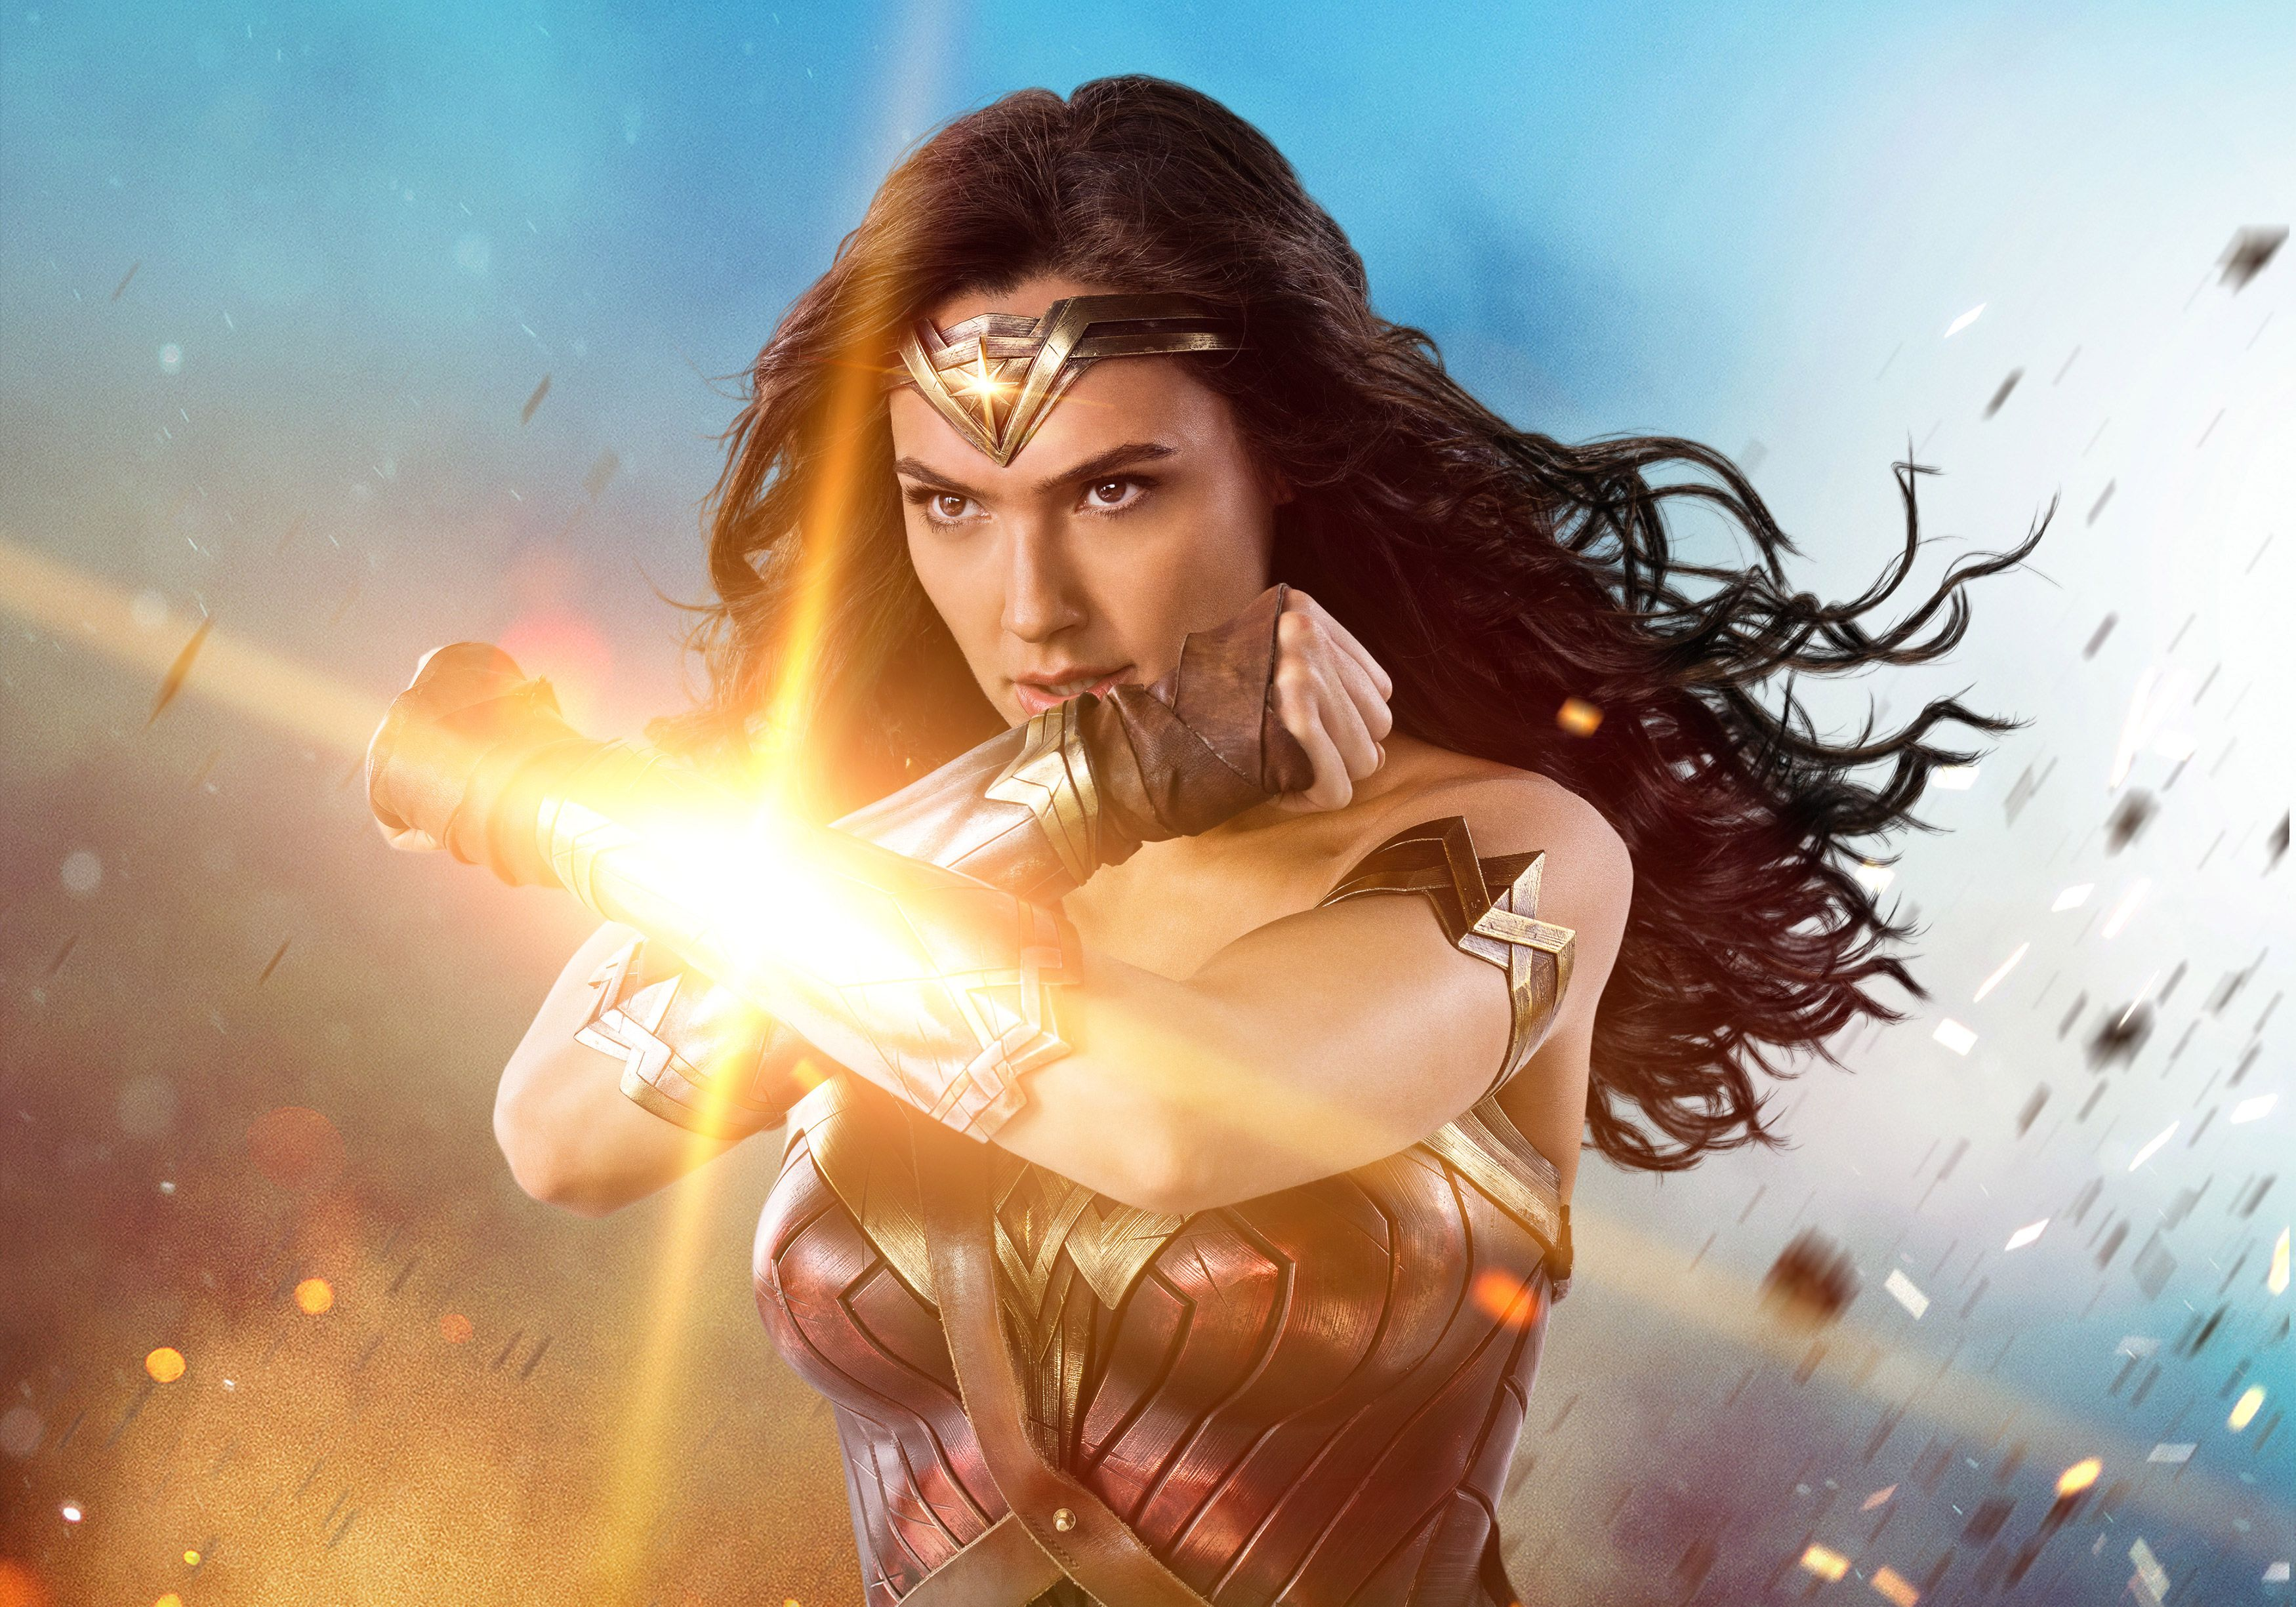 Wonder Woman Wallpapers Top Free Wonder Woman Backgrounds